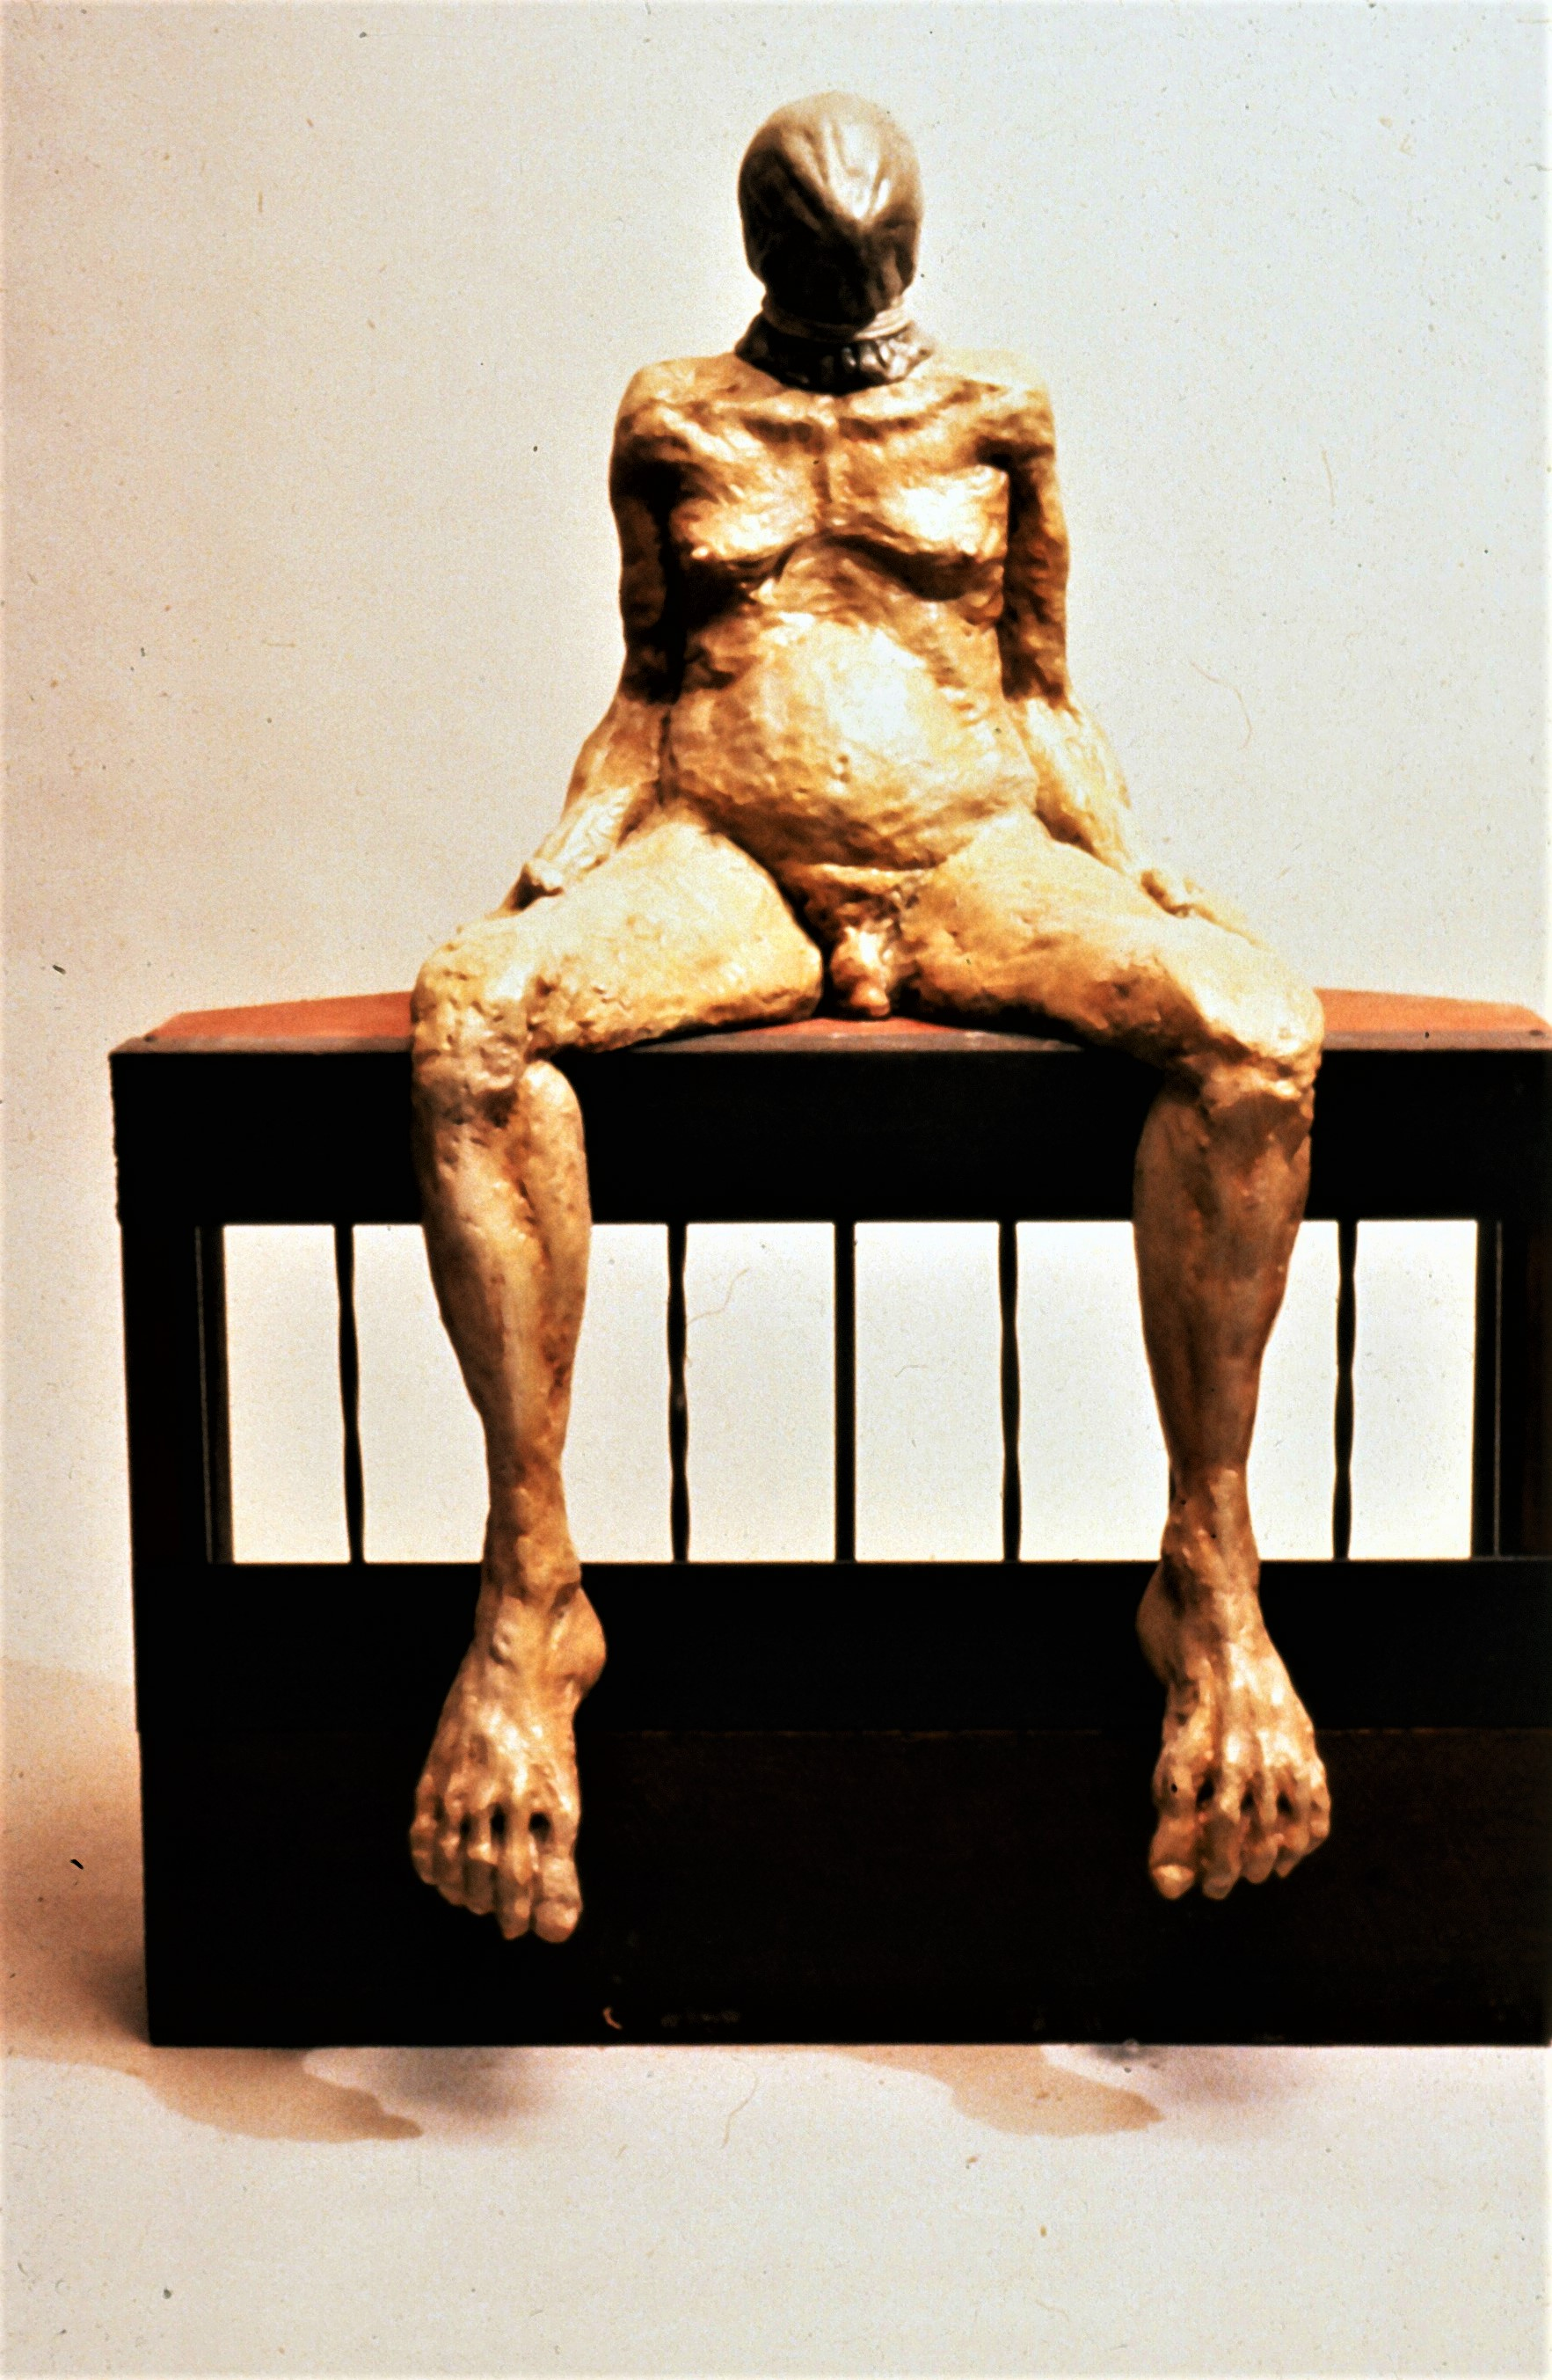 Sitting hooded figure